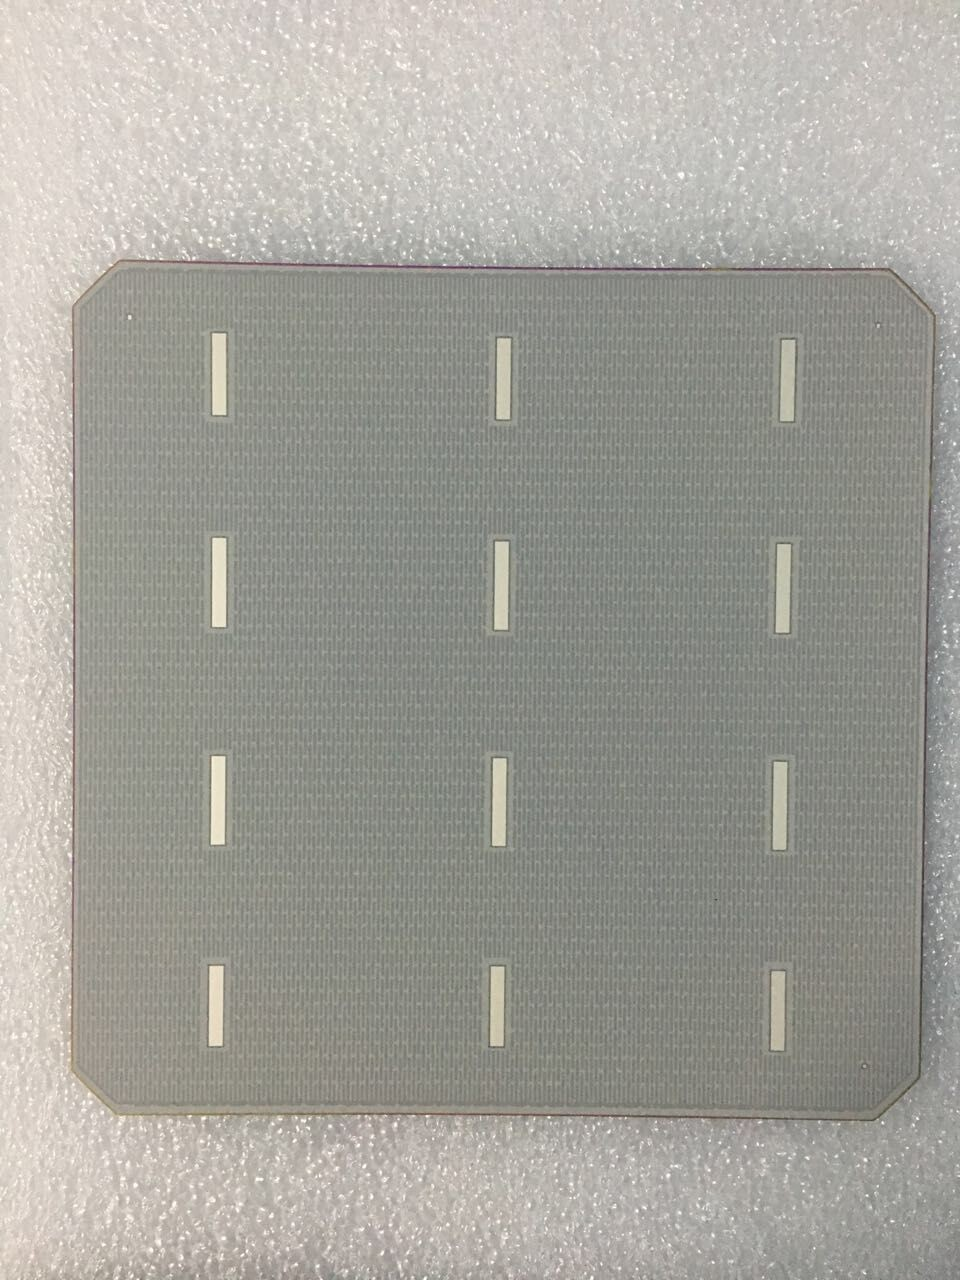 3bb molycristaline célula solar para diy painel solar